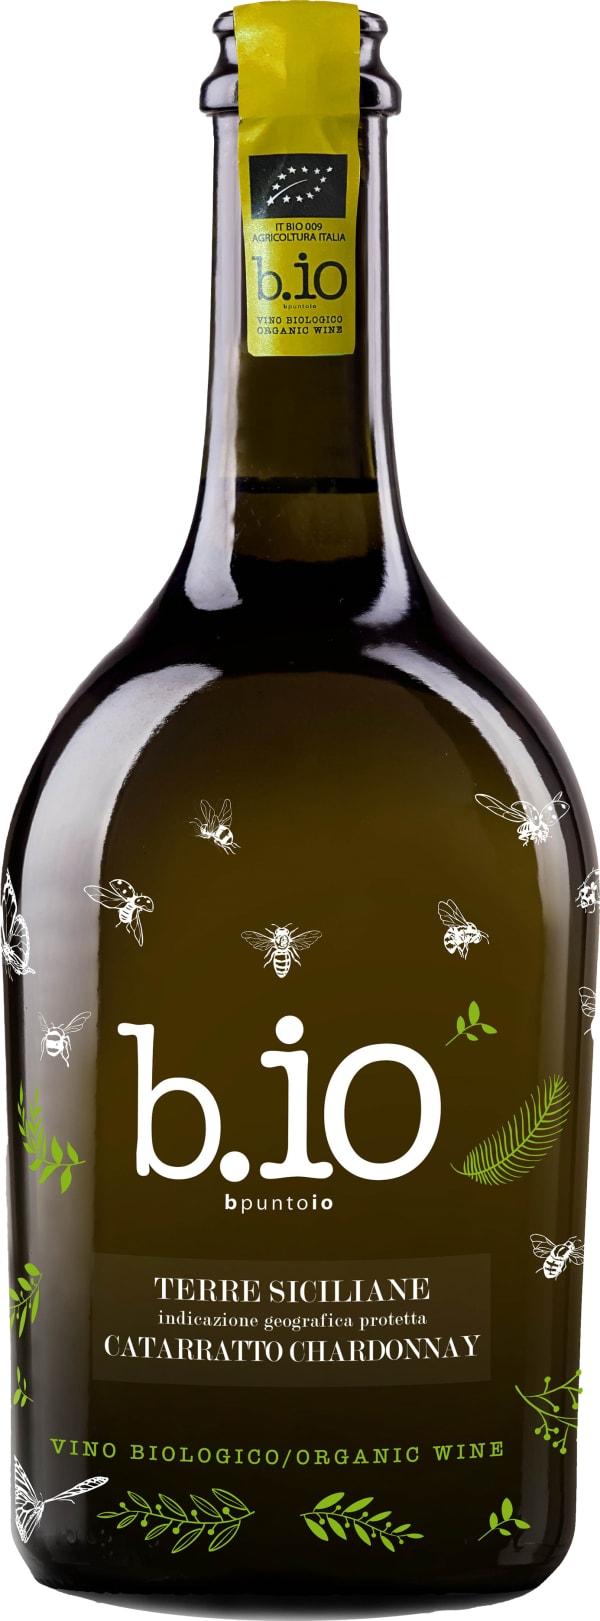 B.io Catarratto Chardonnay Vino Biologico 2018